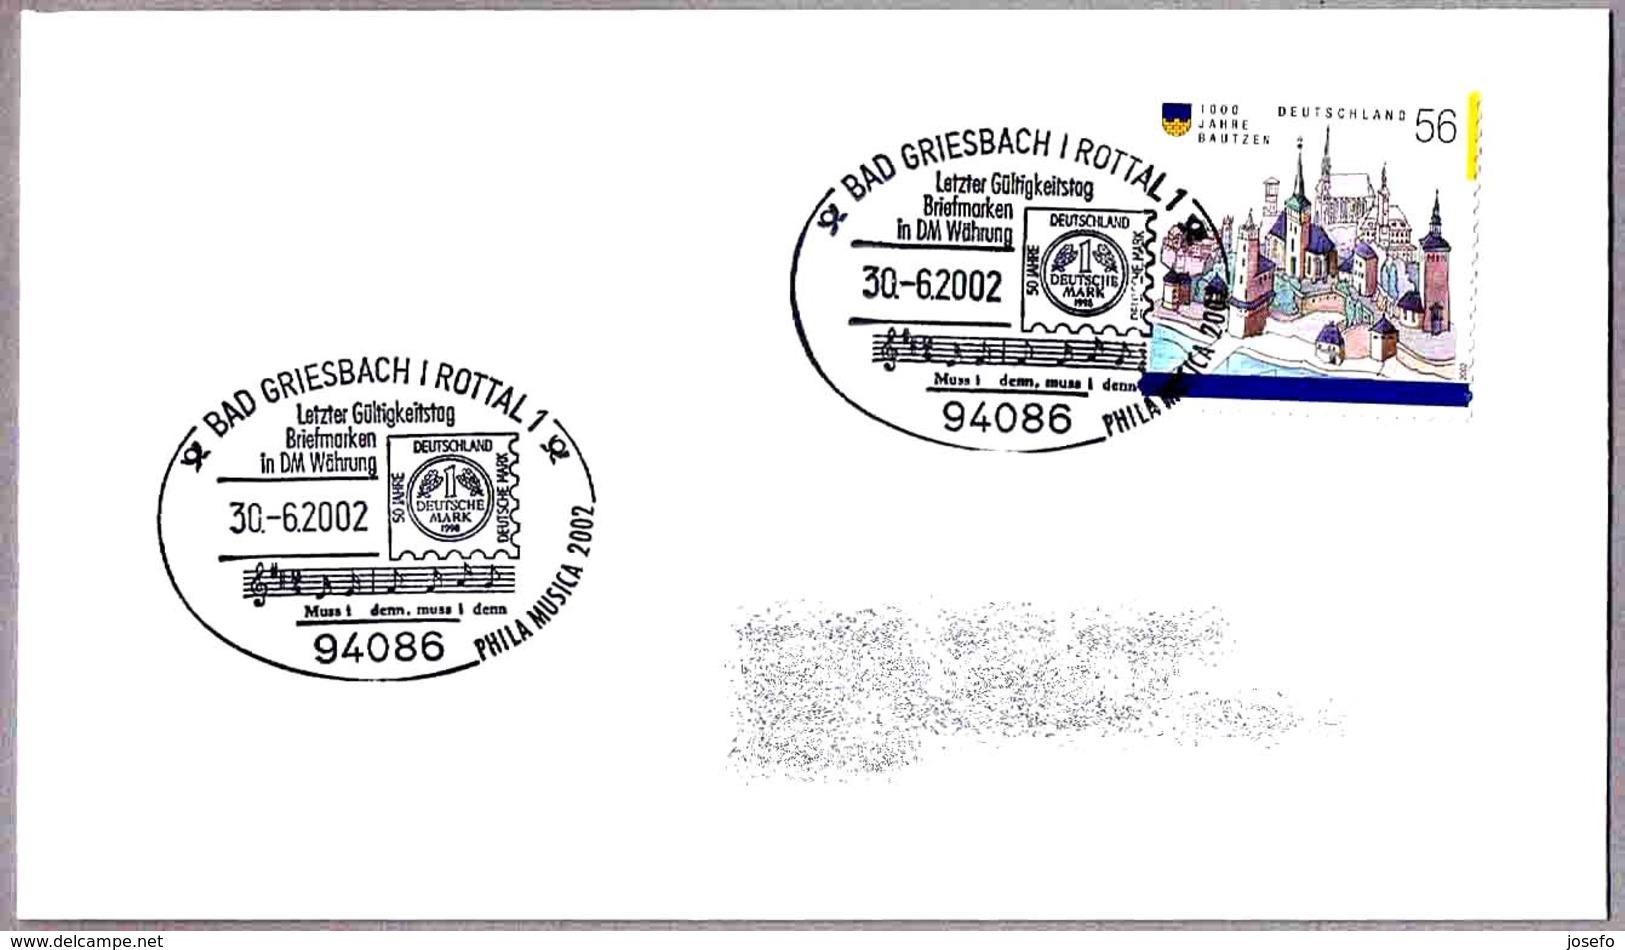 ULTIMO DIA DE VALIDEZ DE SELLOS EN DM - Last Day Of Validity Of Stamps In DM. Bad Griesbach 2002 - Correo Postal